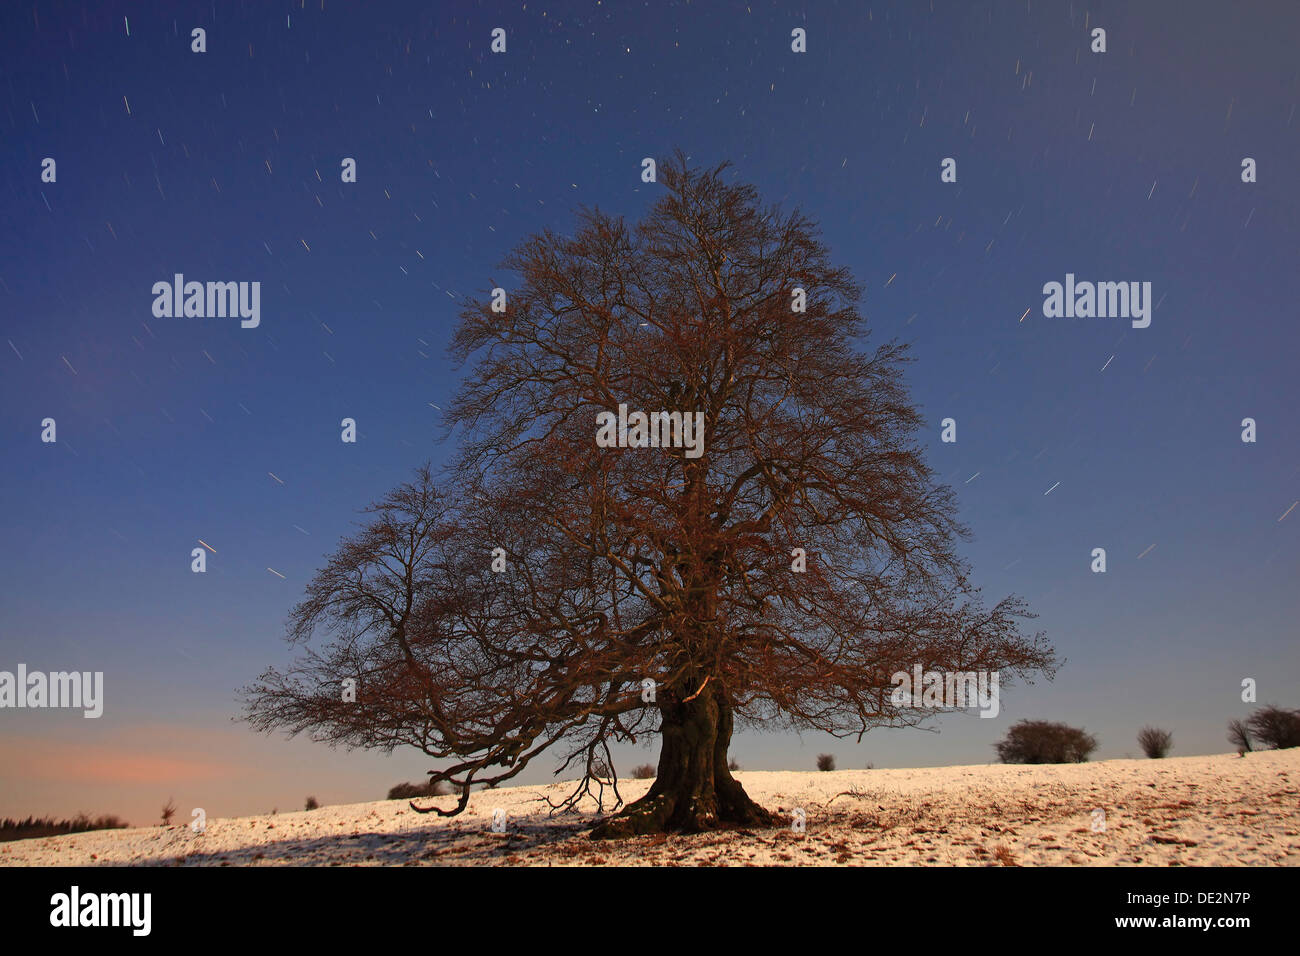 Solitary beech tree in winter, long exposure with stellar orbits, Mt Knoten, Hoher Westerwald region, Hesse - Stock Image